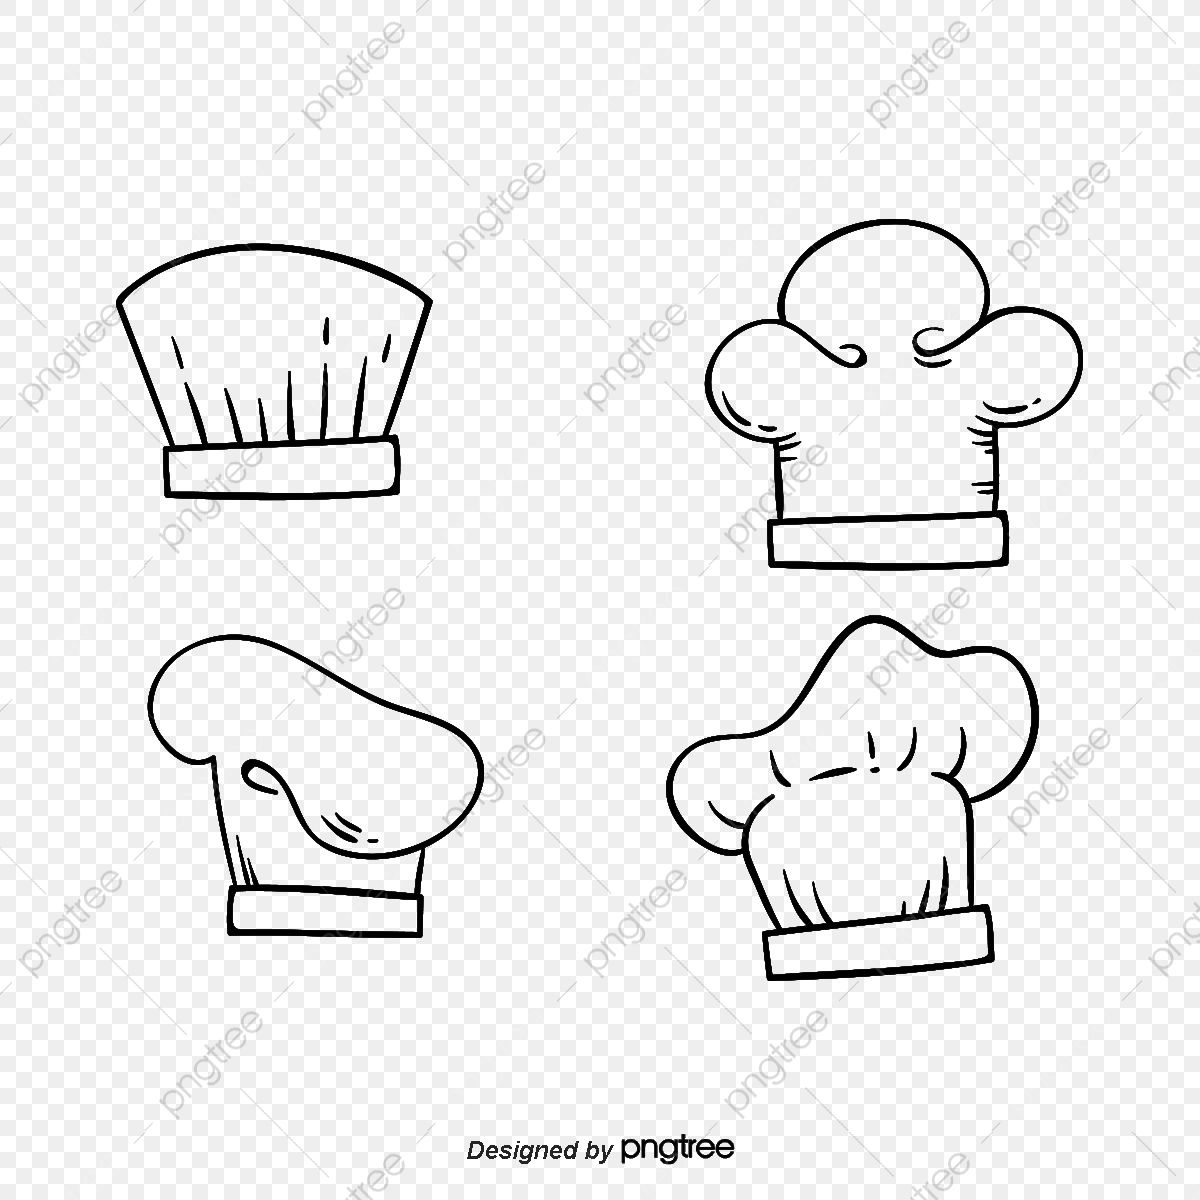 Chef Hat Svg Chef Svg Cook Svg Chef Hat Clipart Chef Hat Etsy In 2021 Chefs Hat Clip Art Powerpoint Clip Art